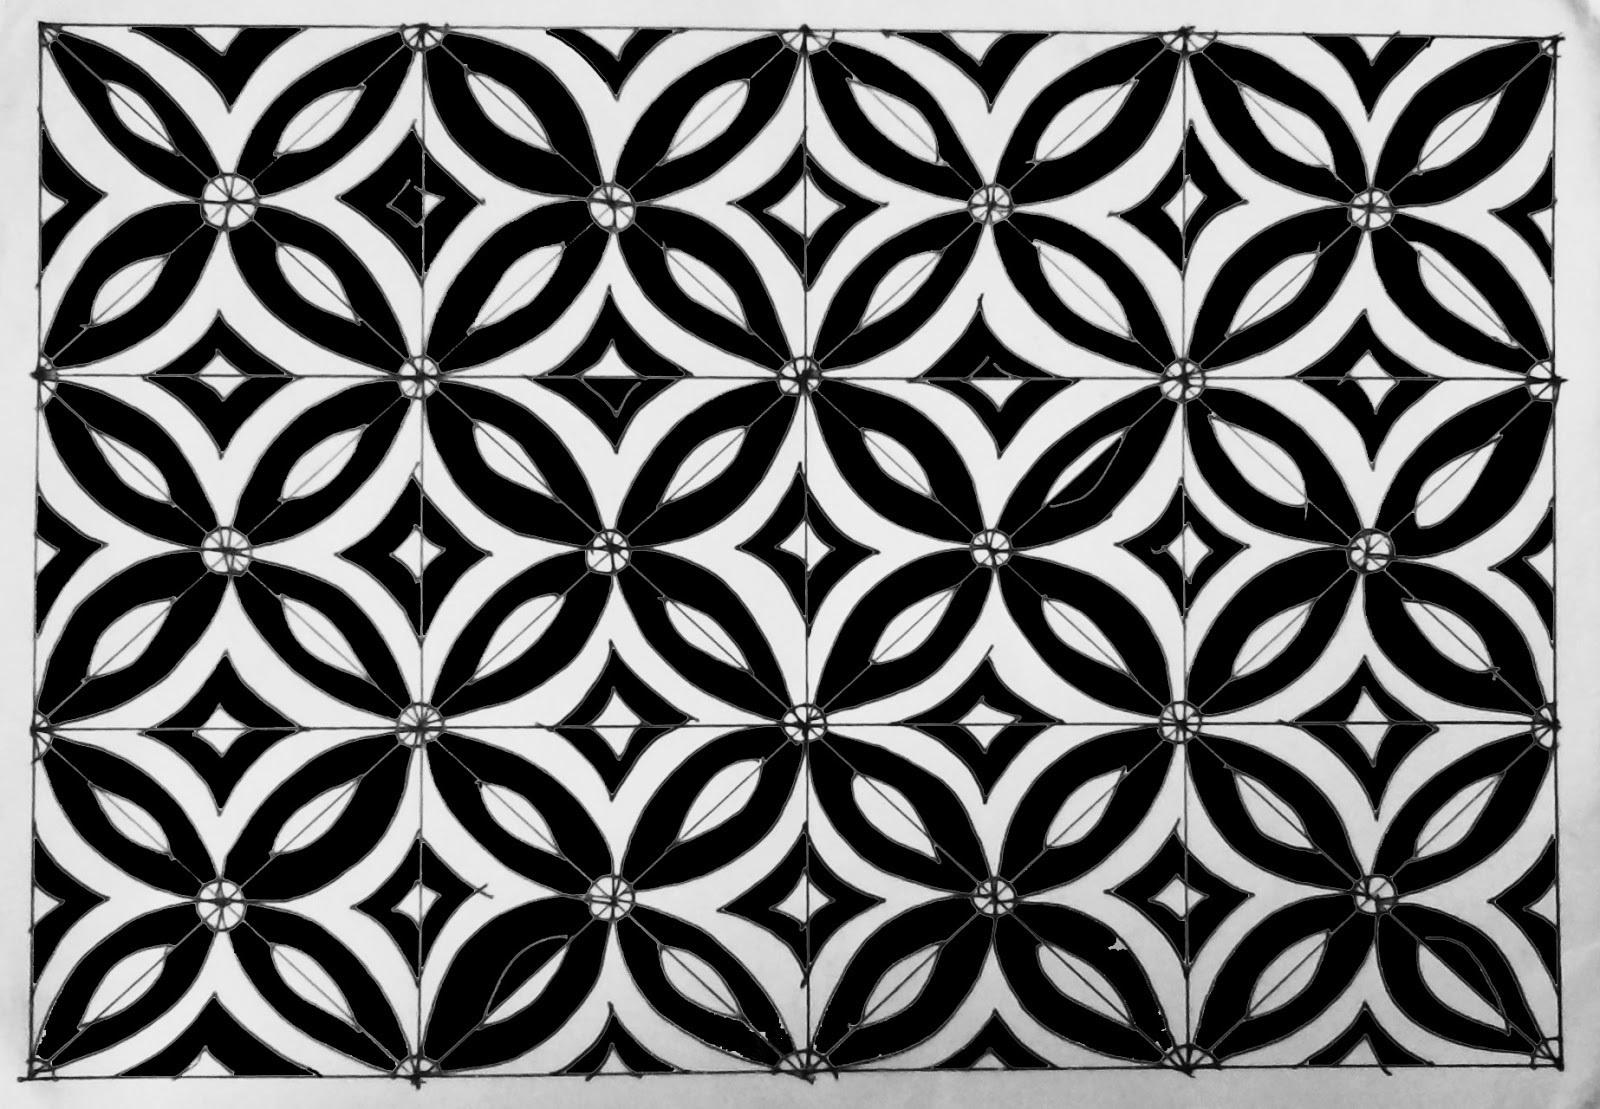 Contoh Gambar Batik Yg Mudah Di Gambar Brainlycoid